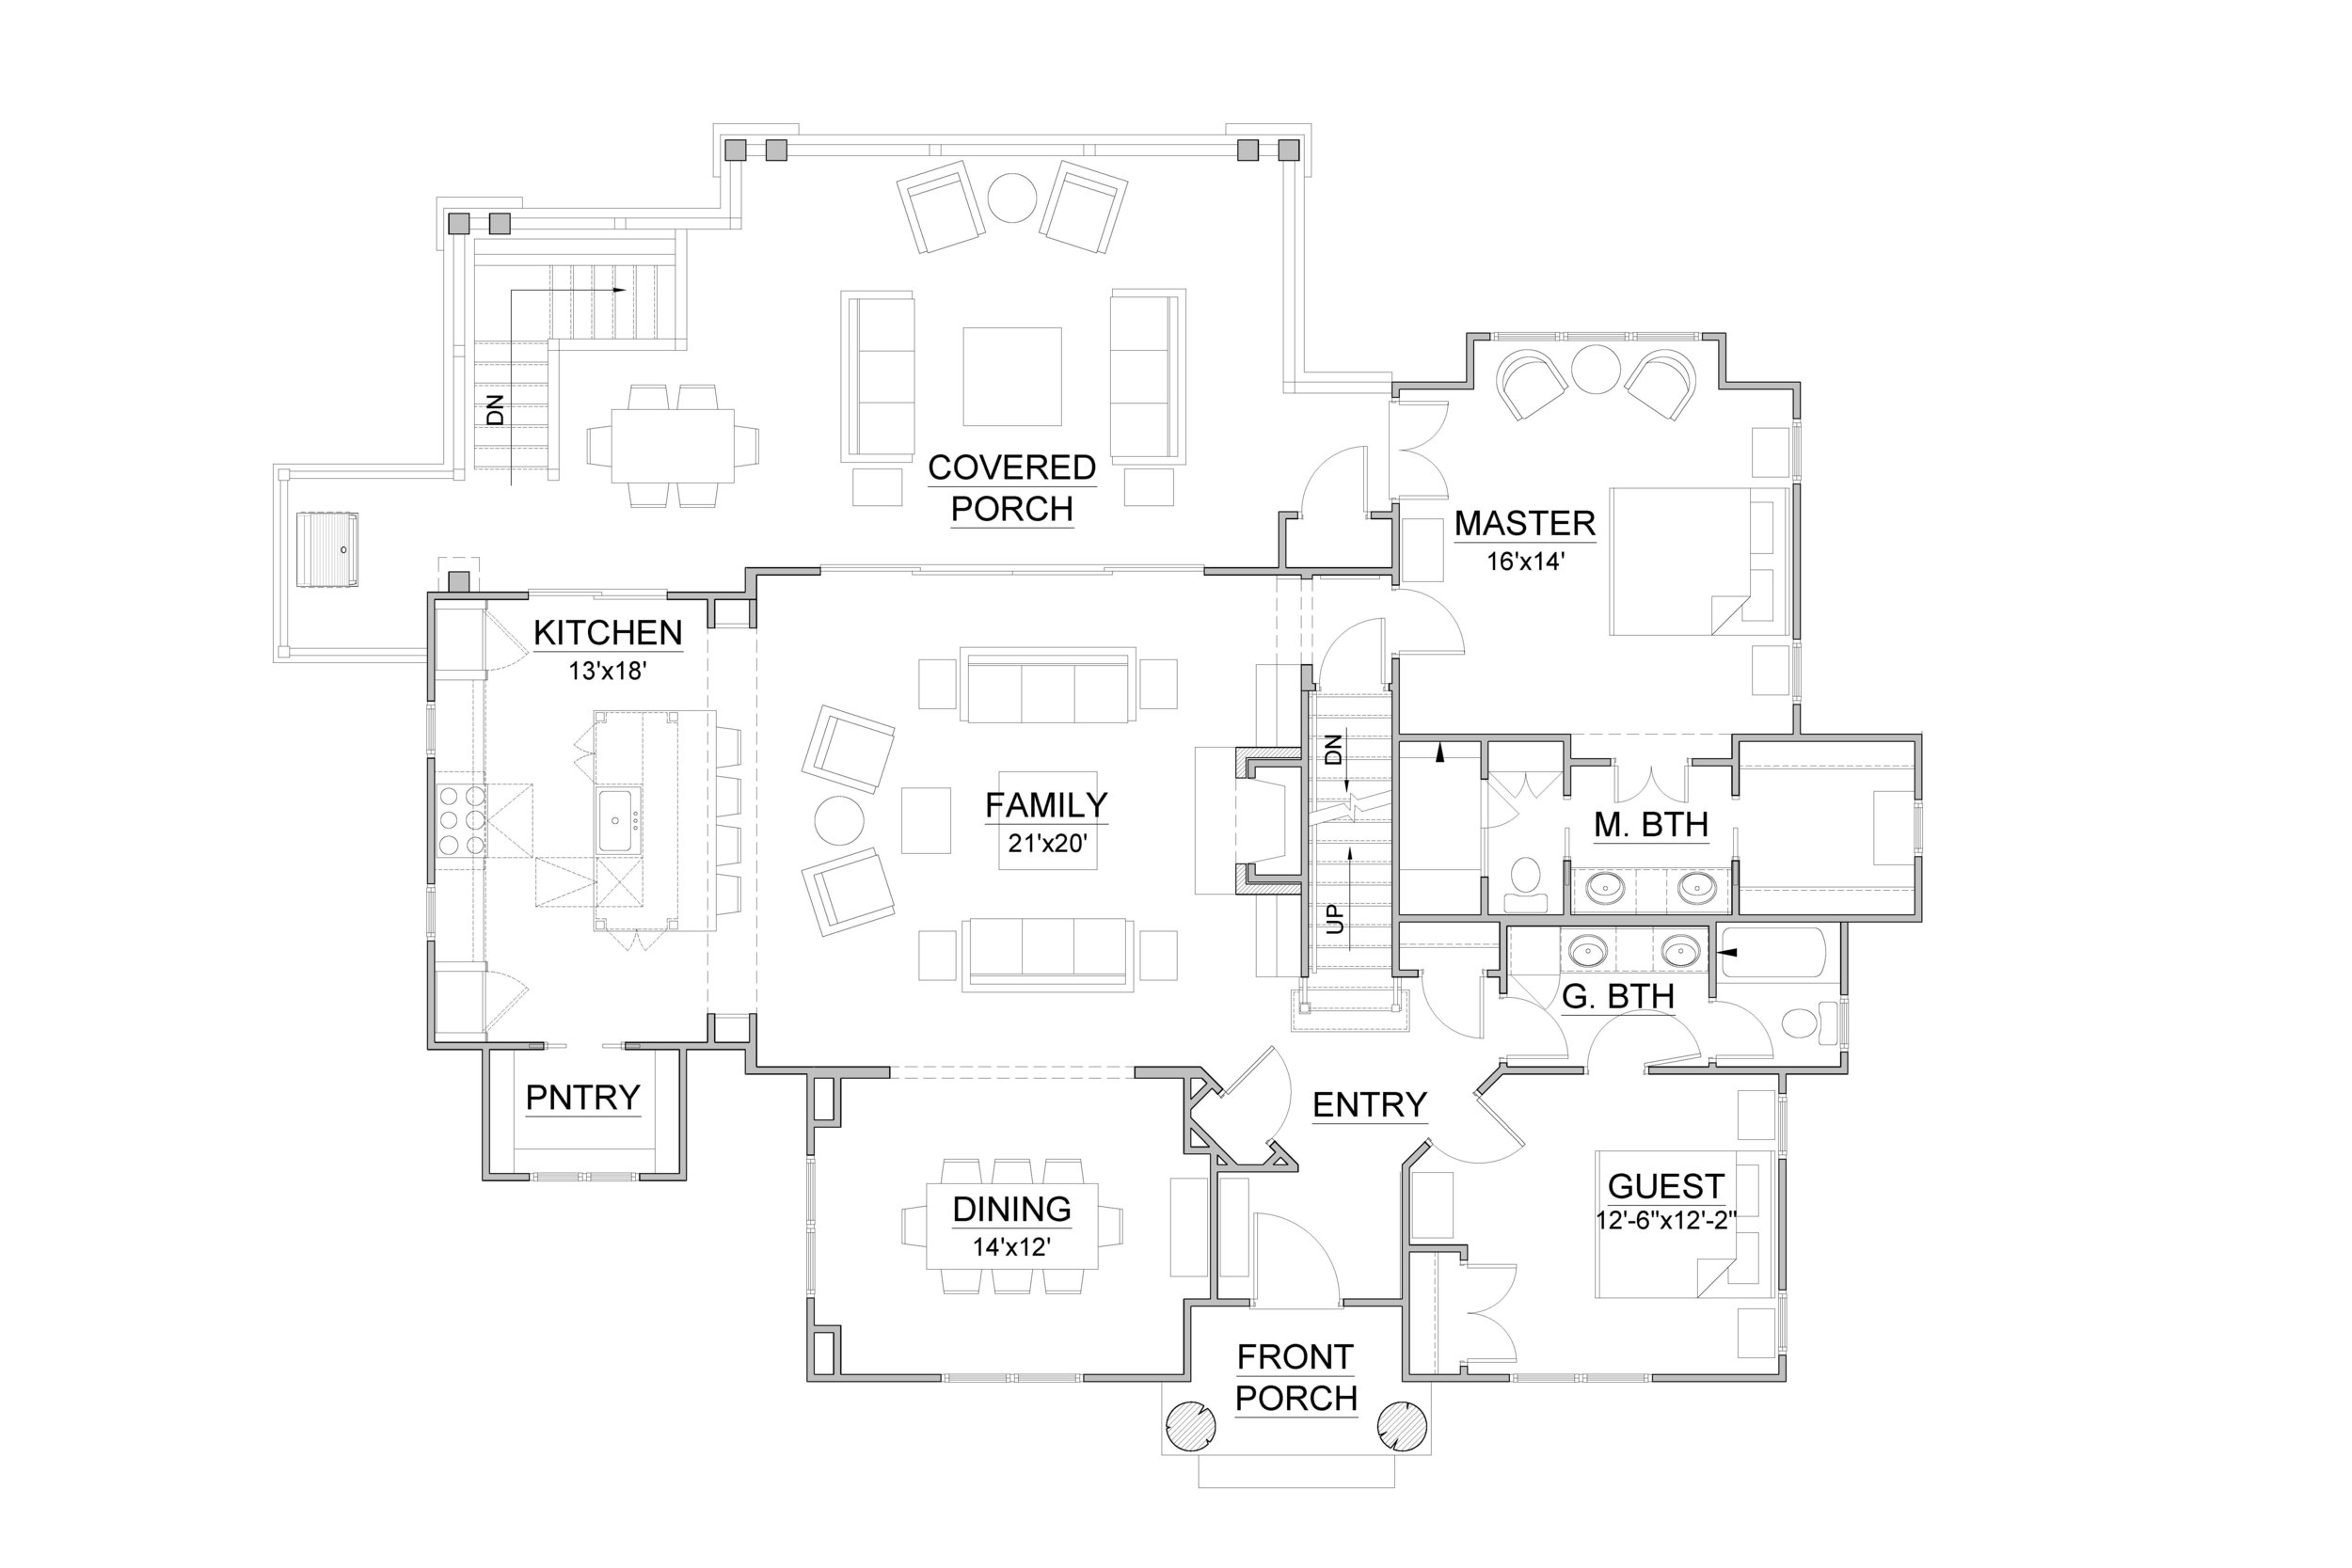 Sovine_First Floor_24x36.jpg